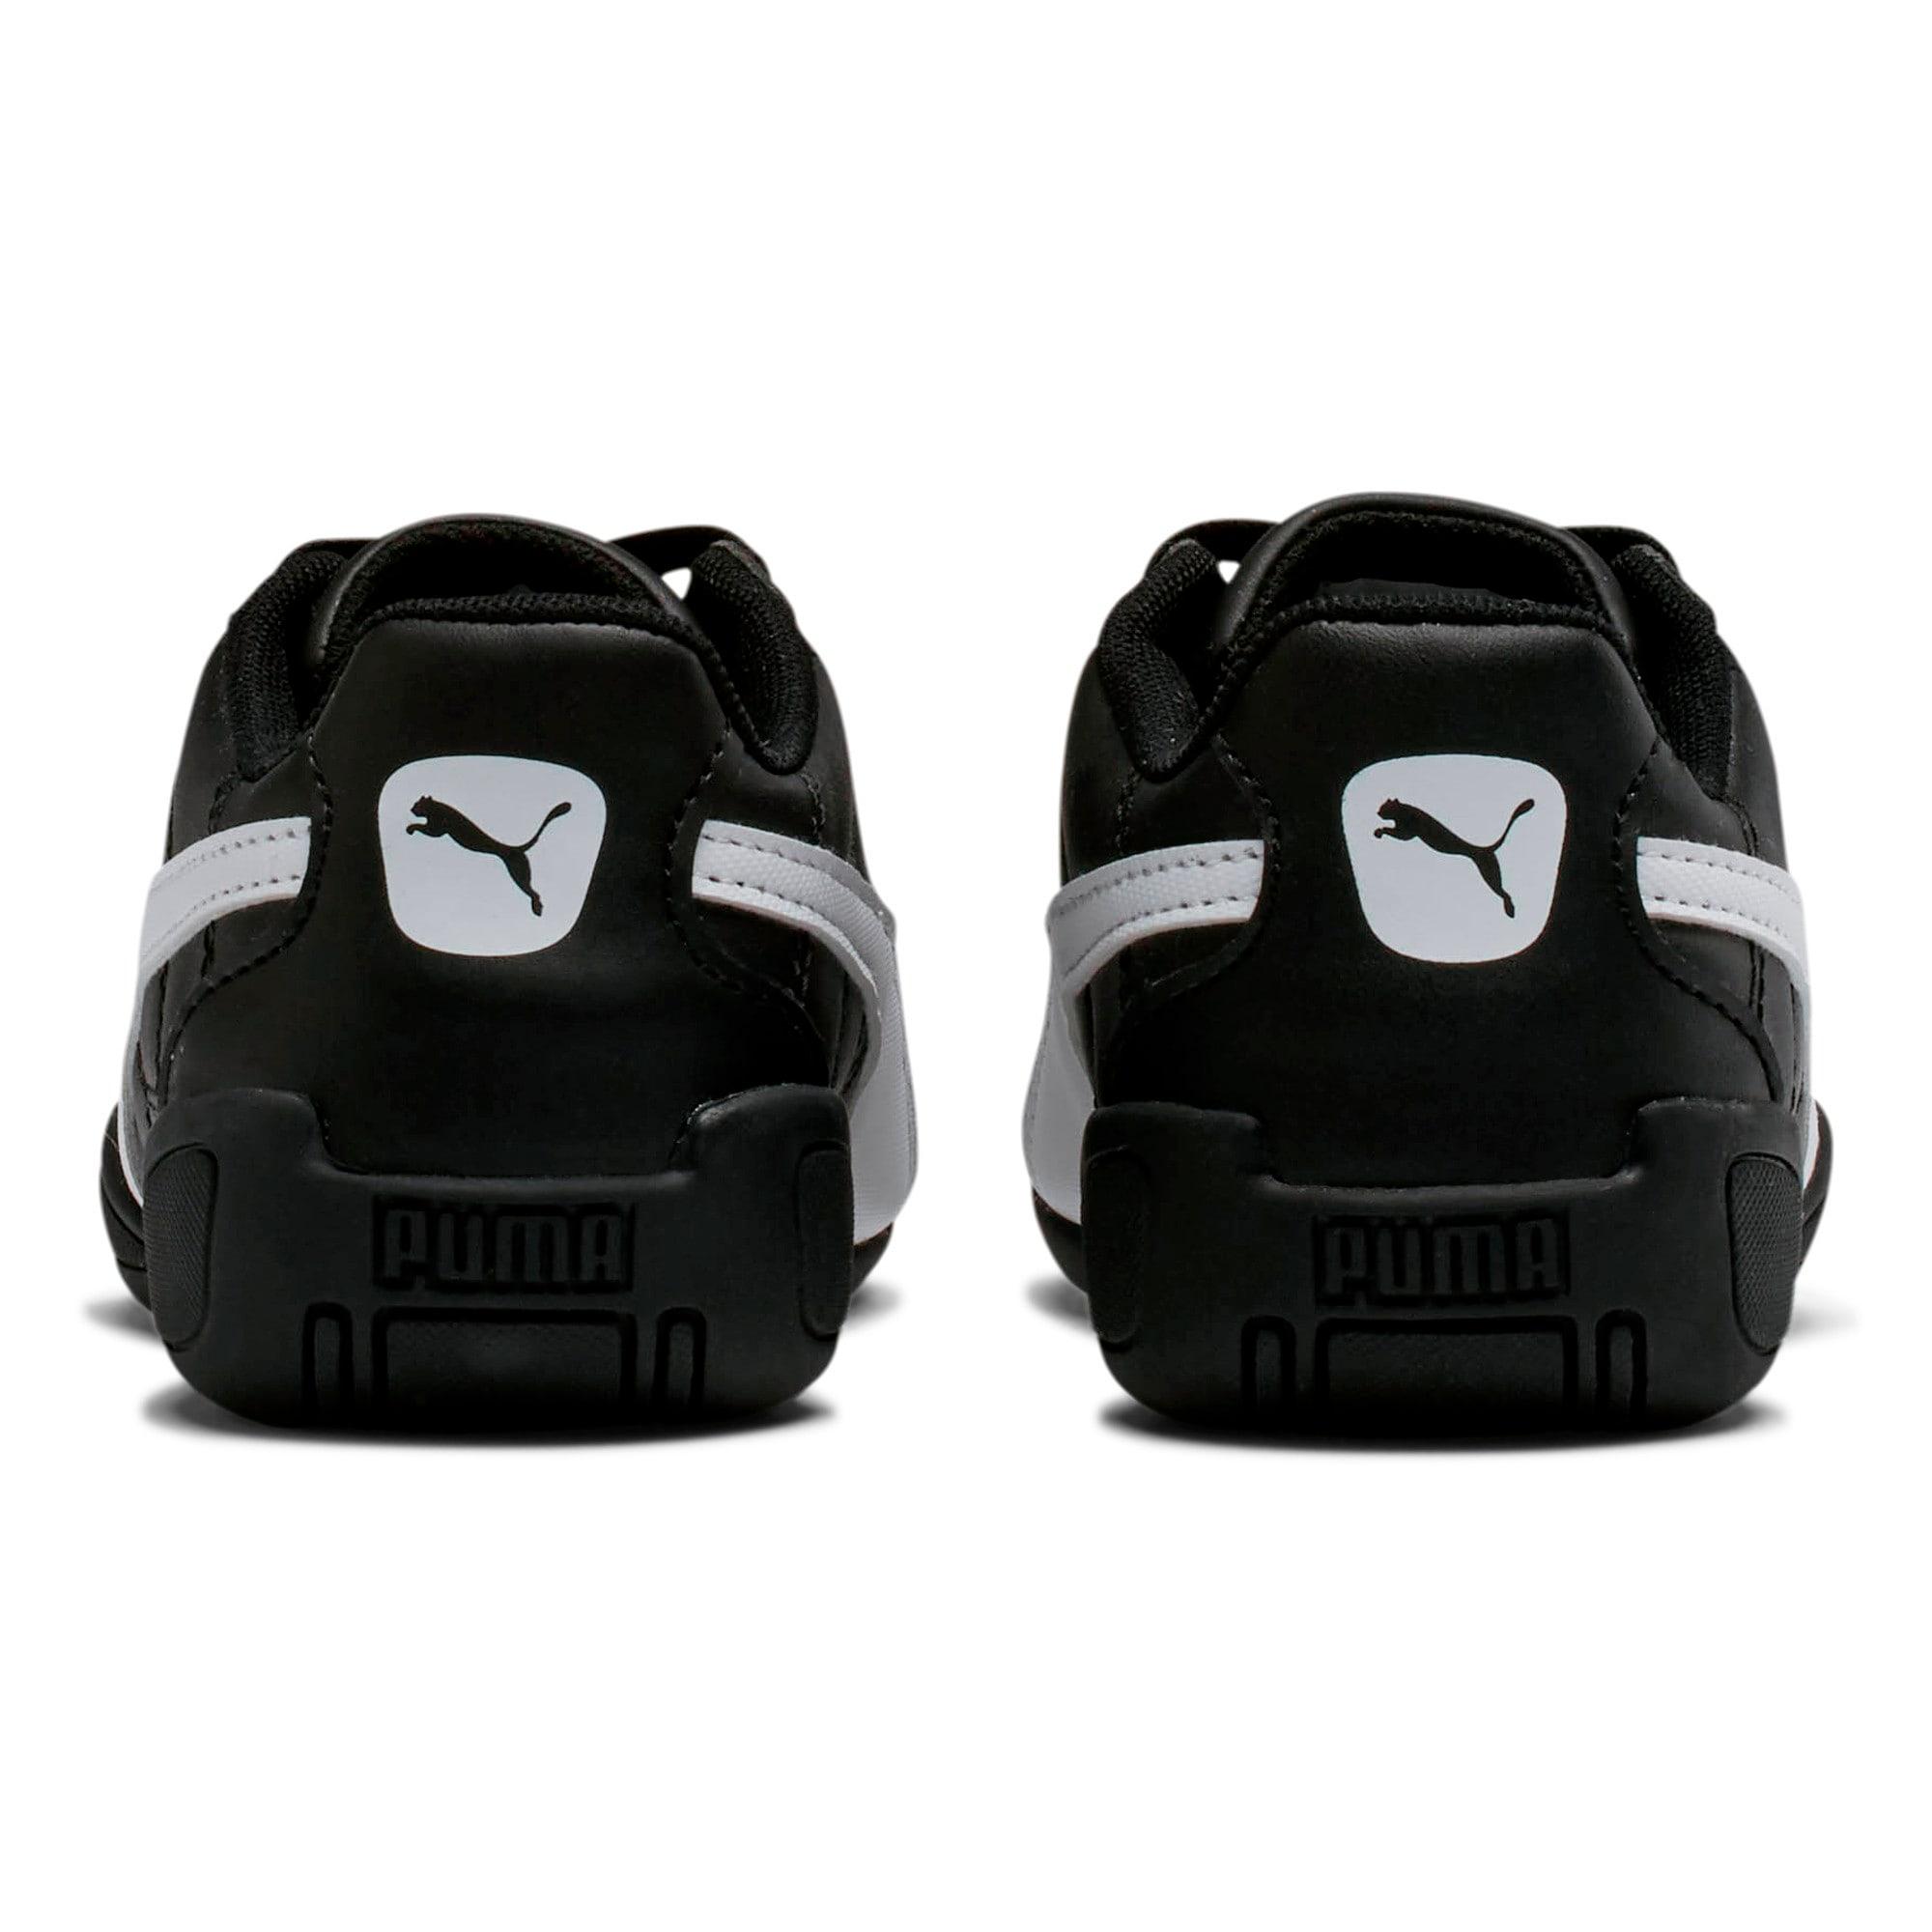 Thumbnail 3 of Tune Cat 3 Little Kids' Shoes, Puma Black-Puma White, medium